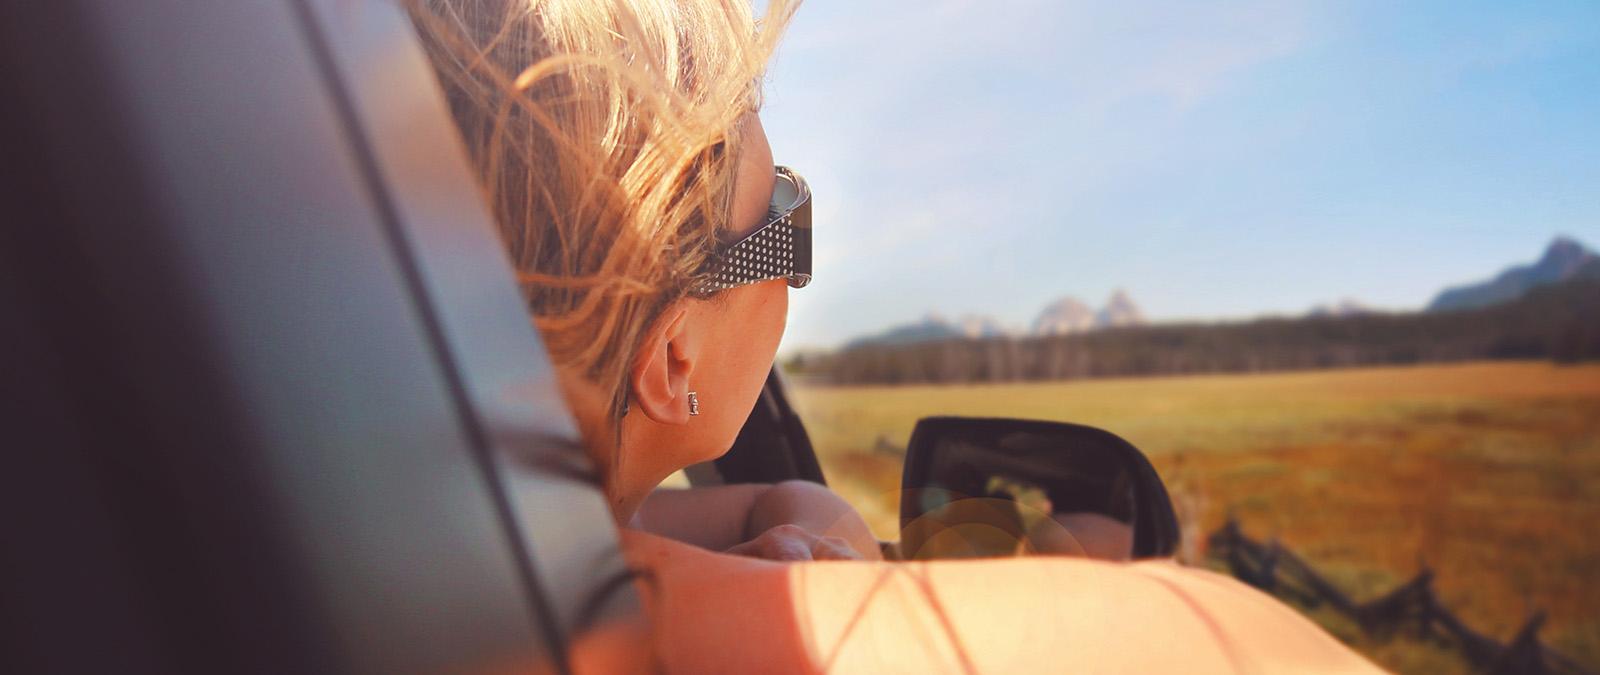 pelican consumer blog 5 most scenic drives in america